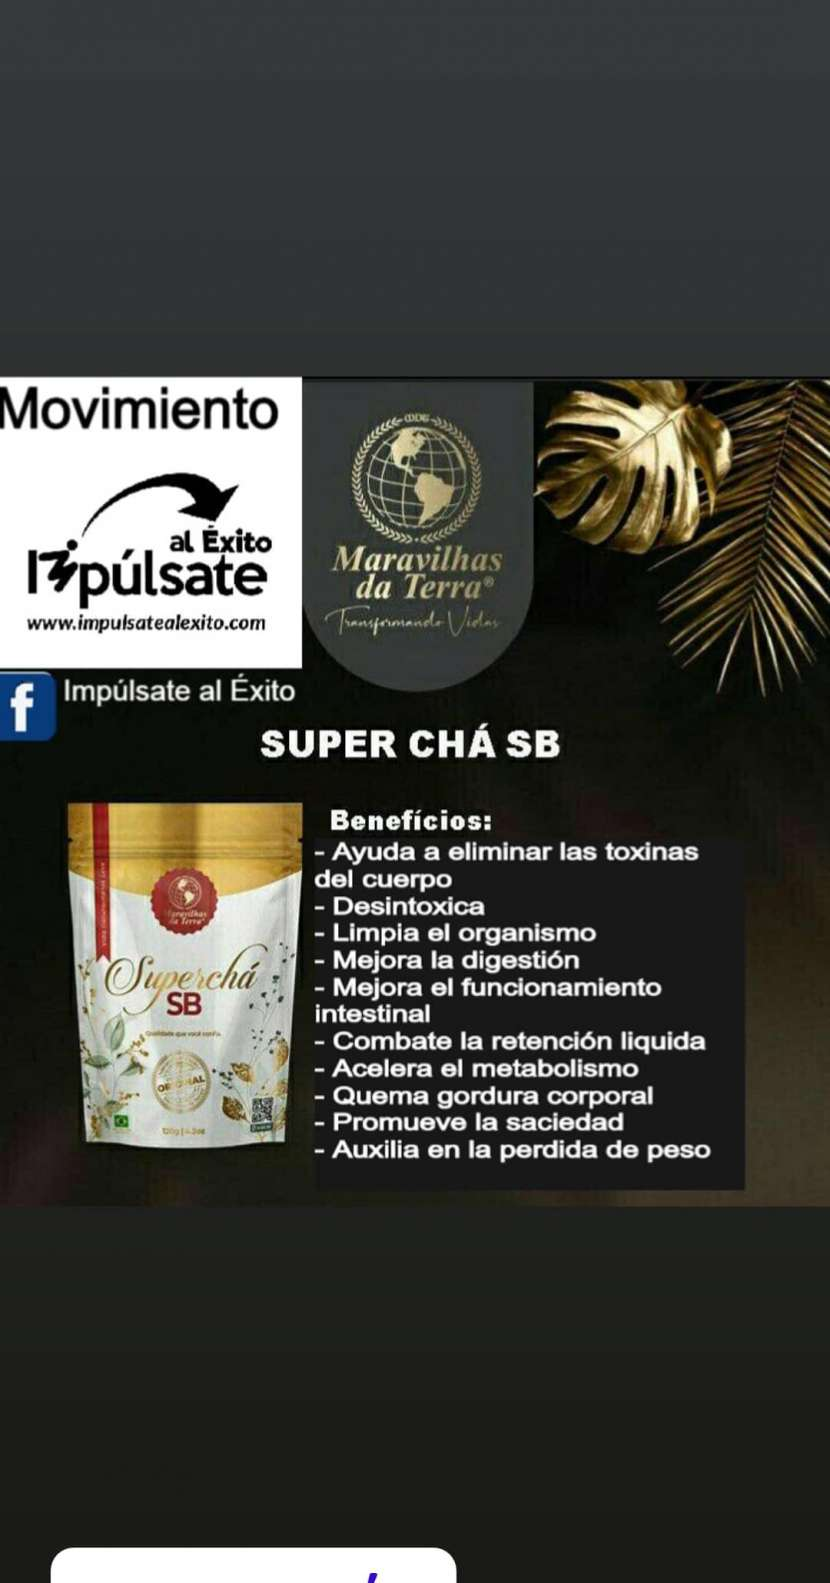 Super Cha SB - 2